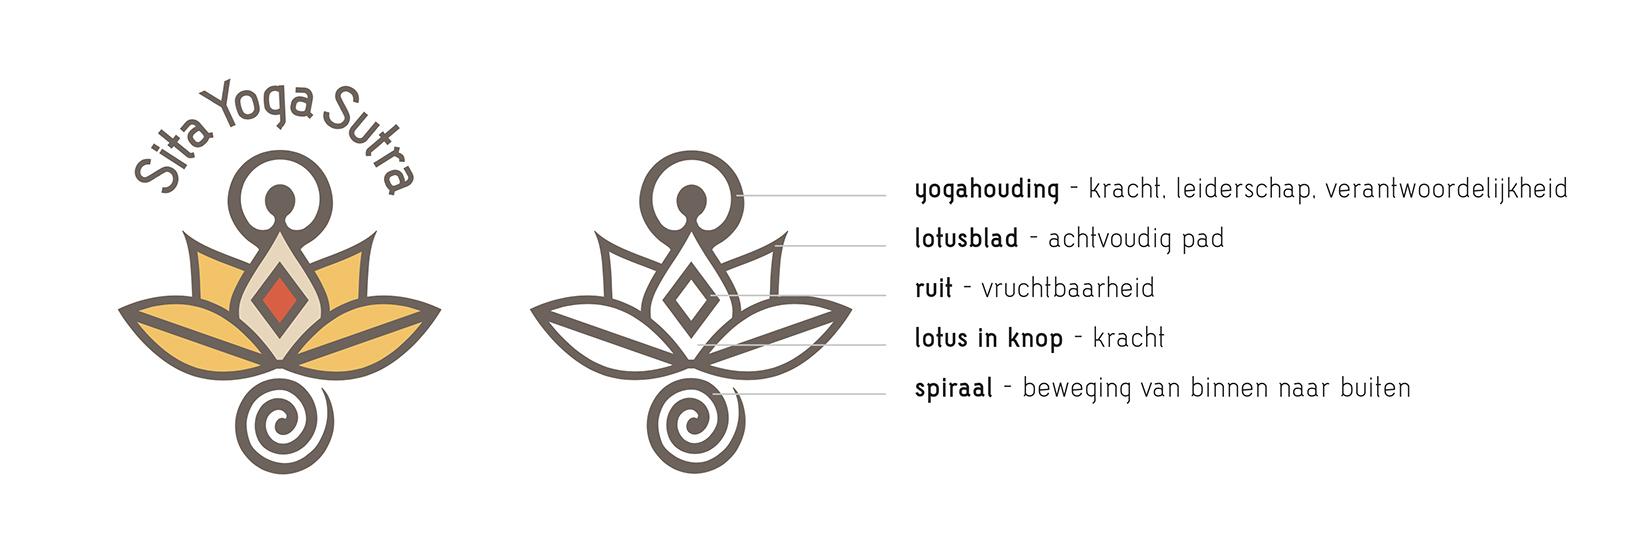 Sita Yoga Sutra logo ontwerp